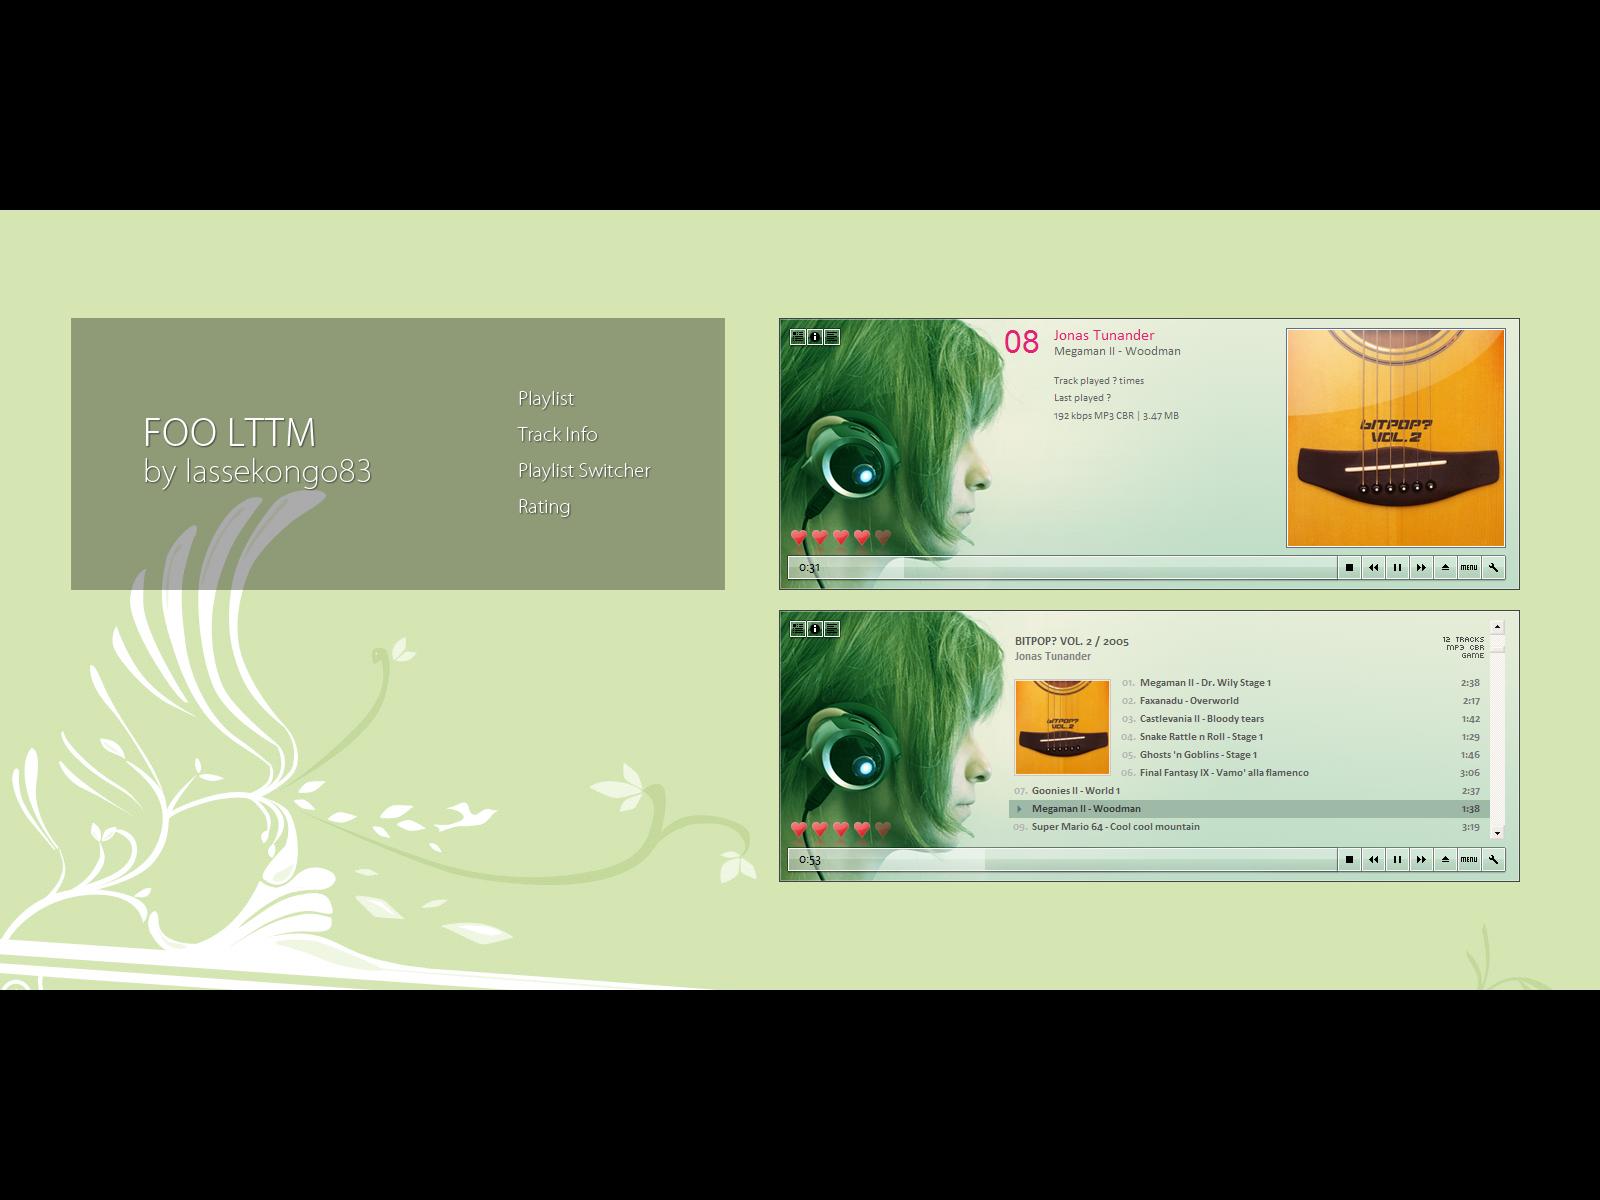 Foo LTTM -Listen To The Music-